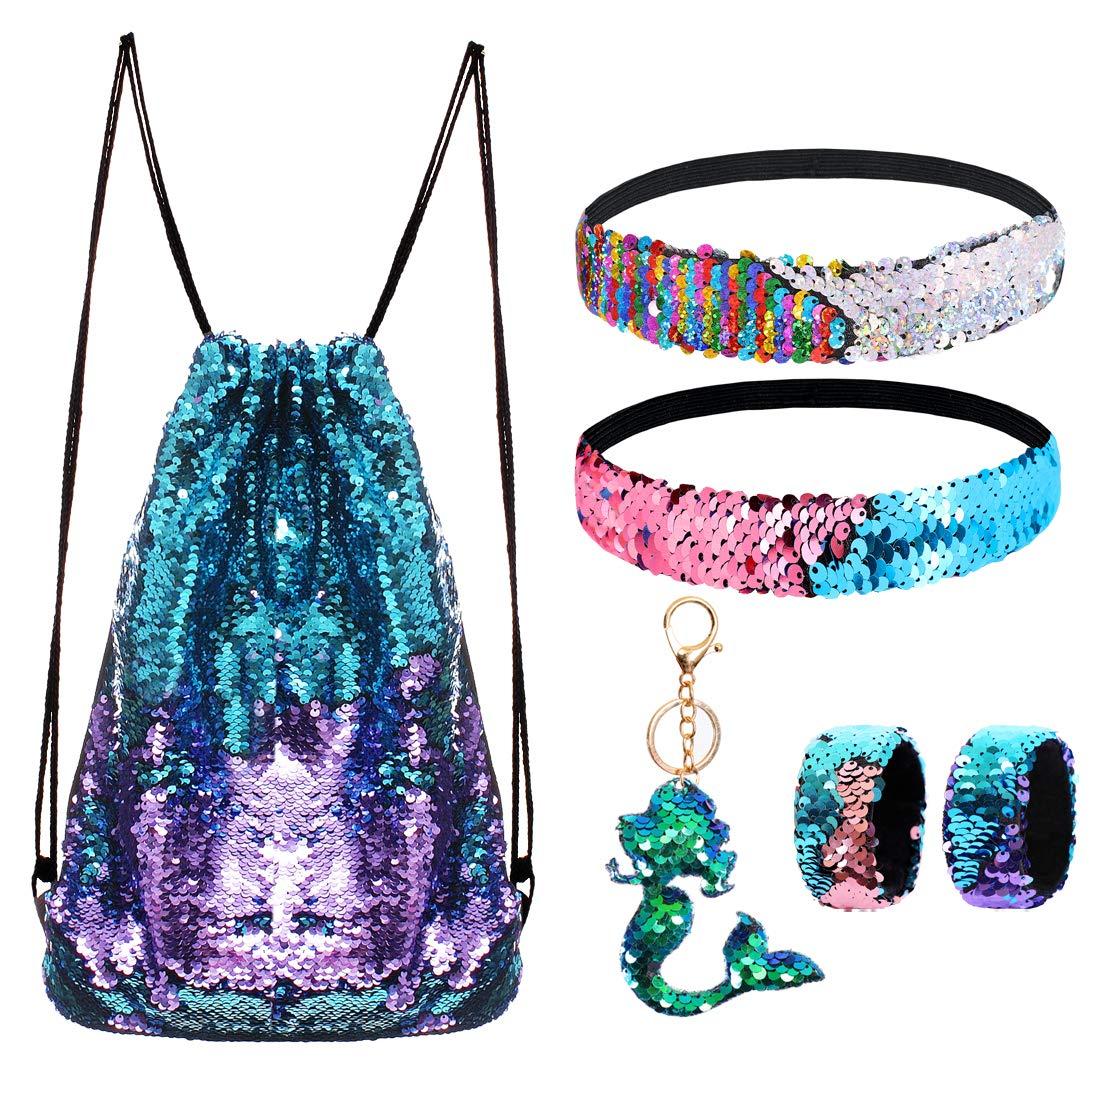 Mermaid Reversible Sequin Drawstring Backpack/Bag Blue/Purple for Kids Girls by GADGETS ENTREPOT